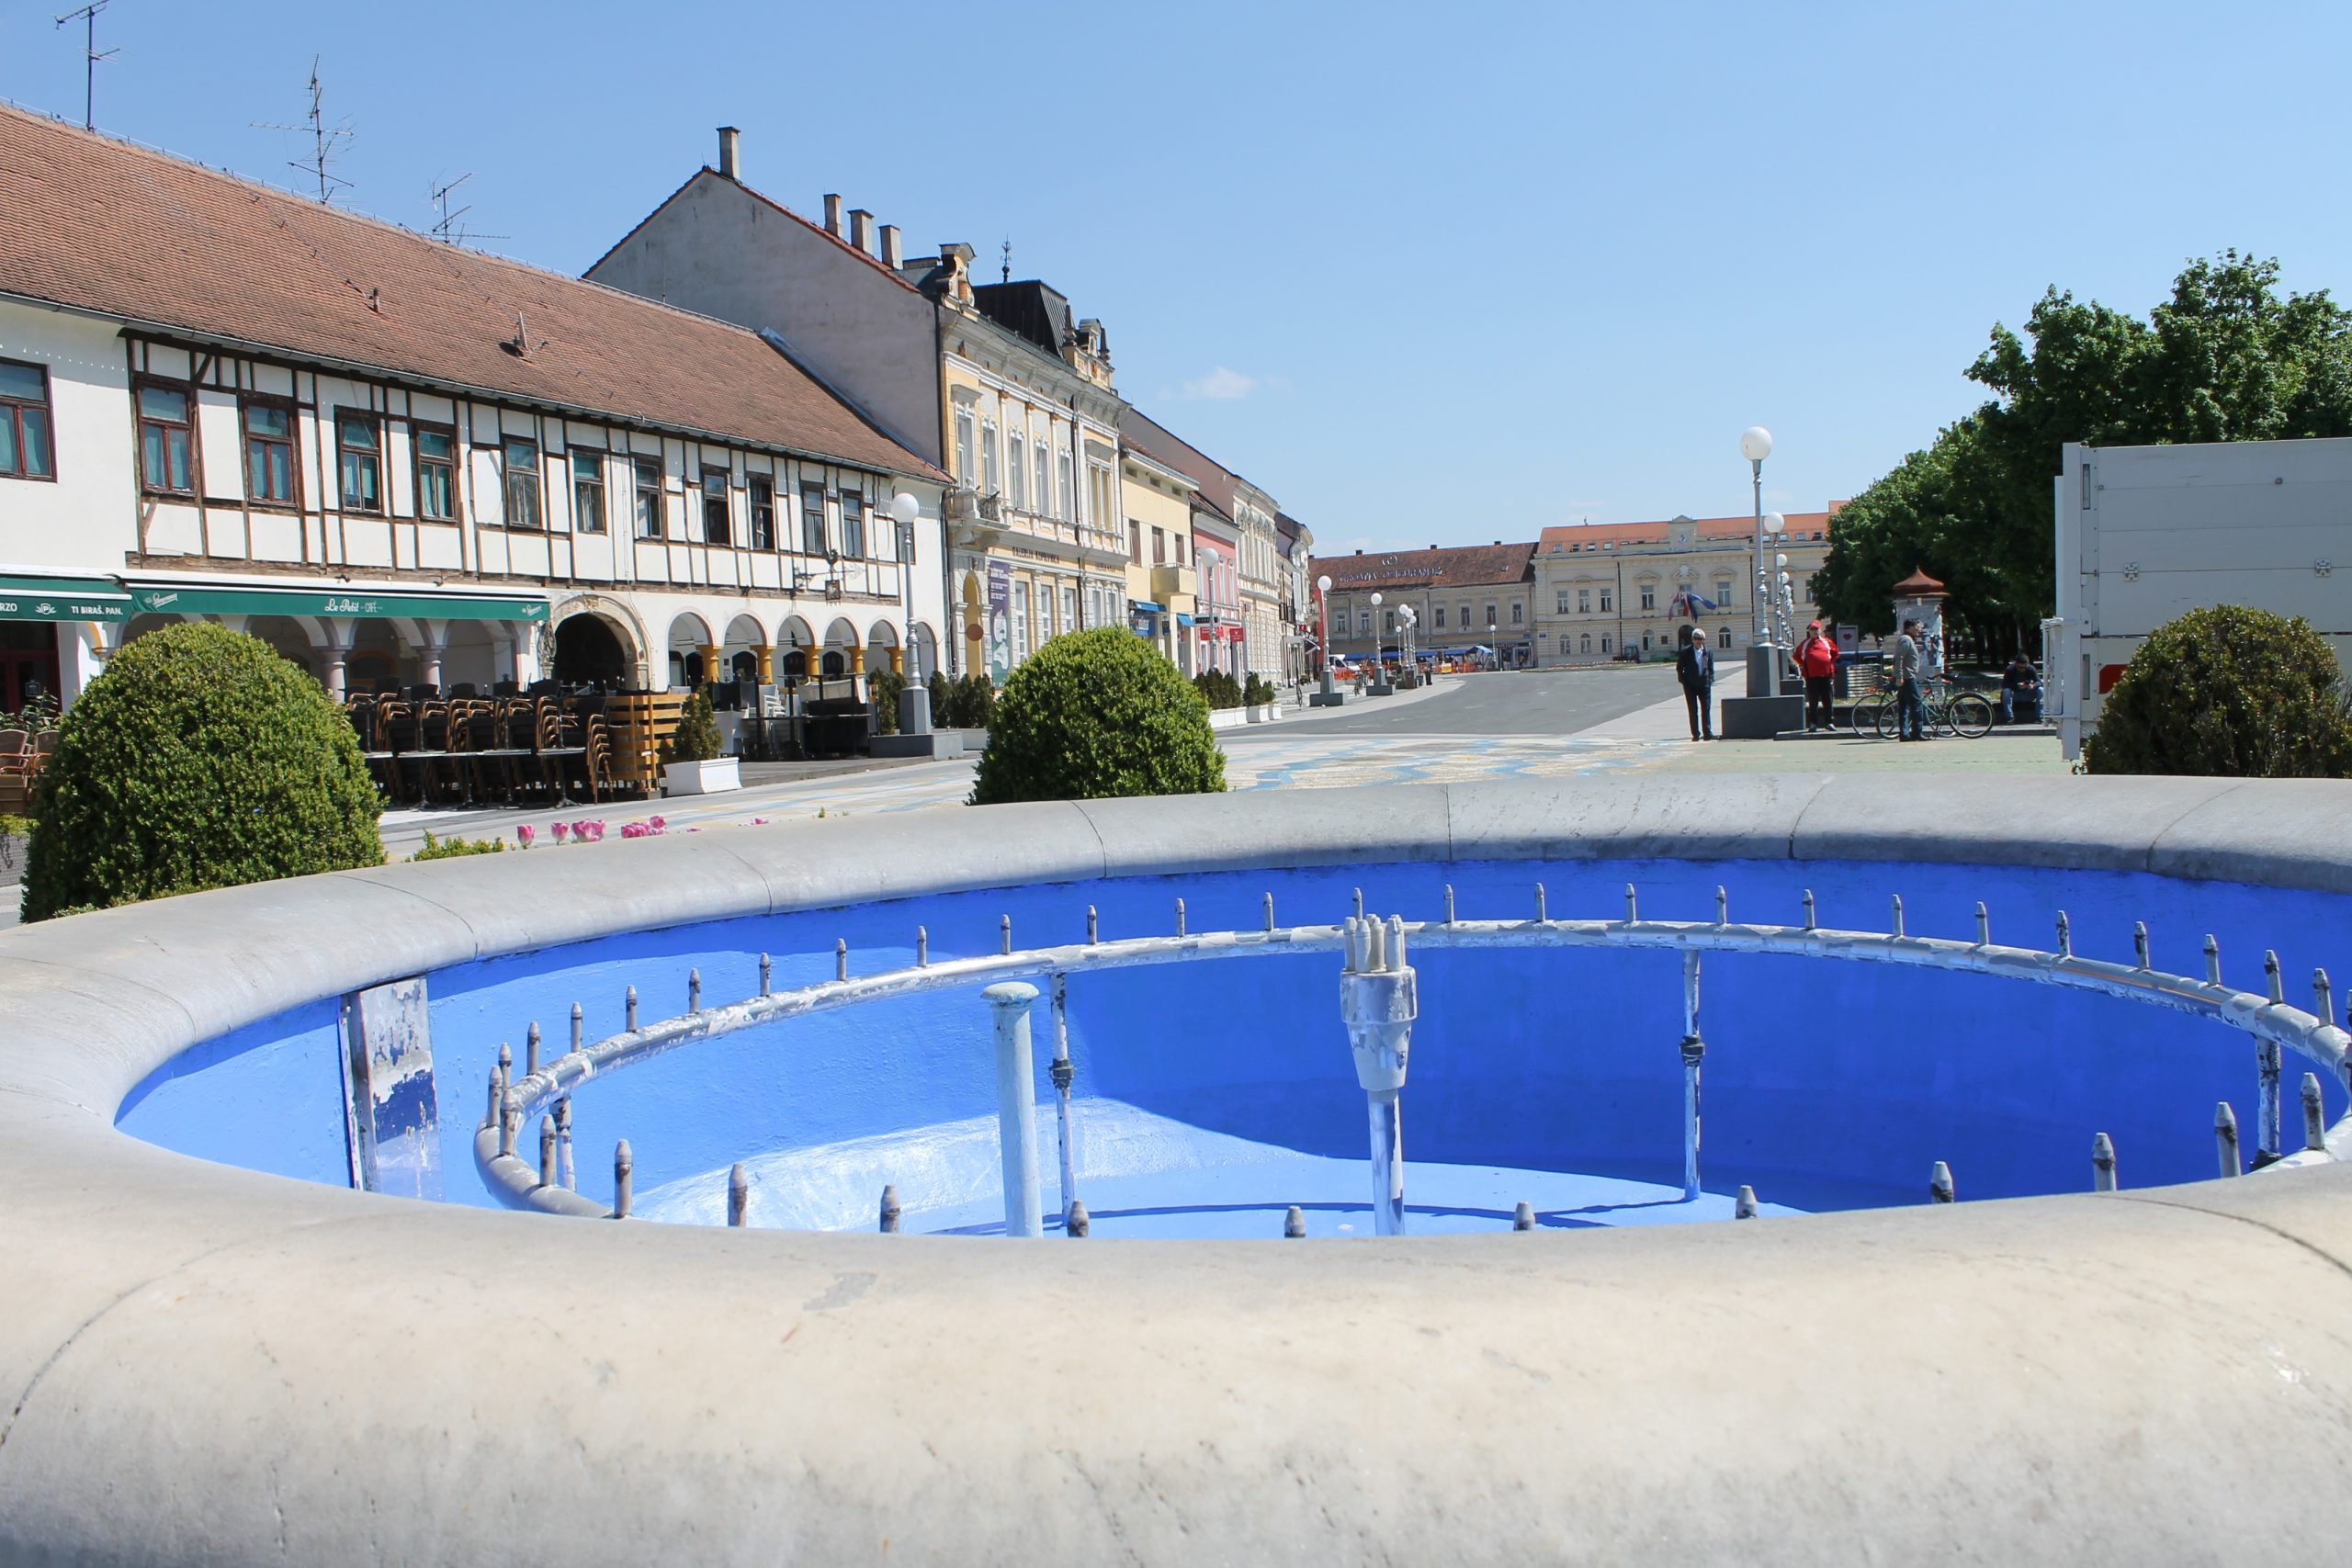 Obnovljene gradske fontane spremne za vodenu rapsodiju